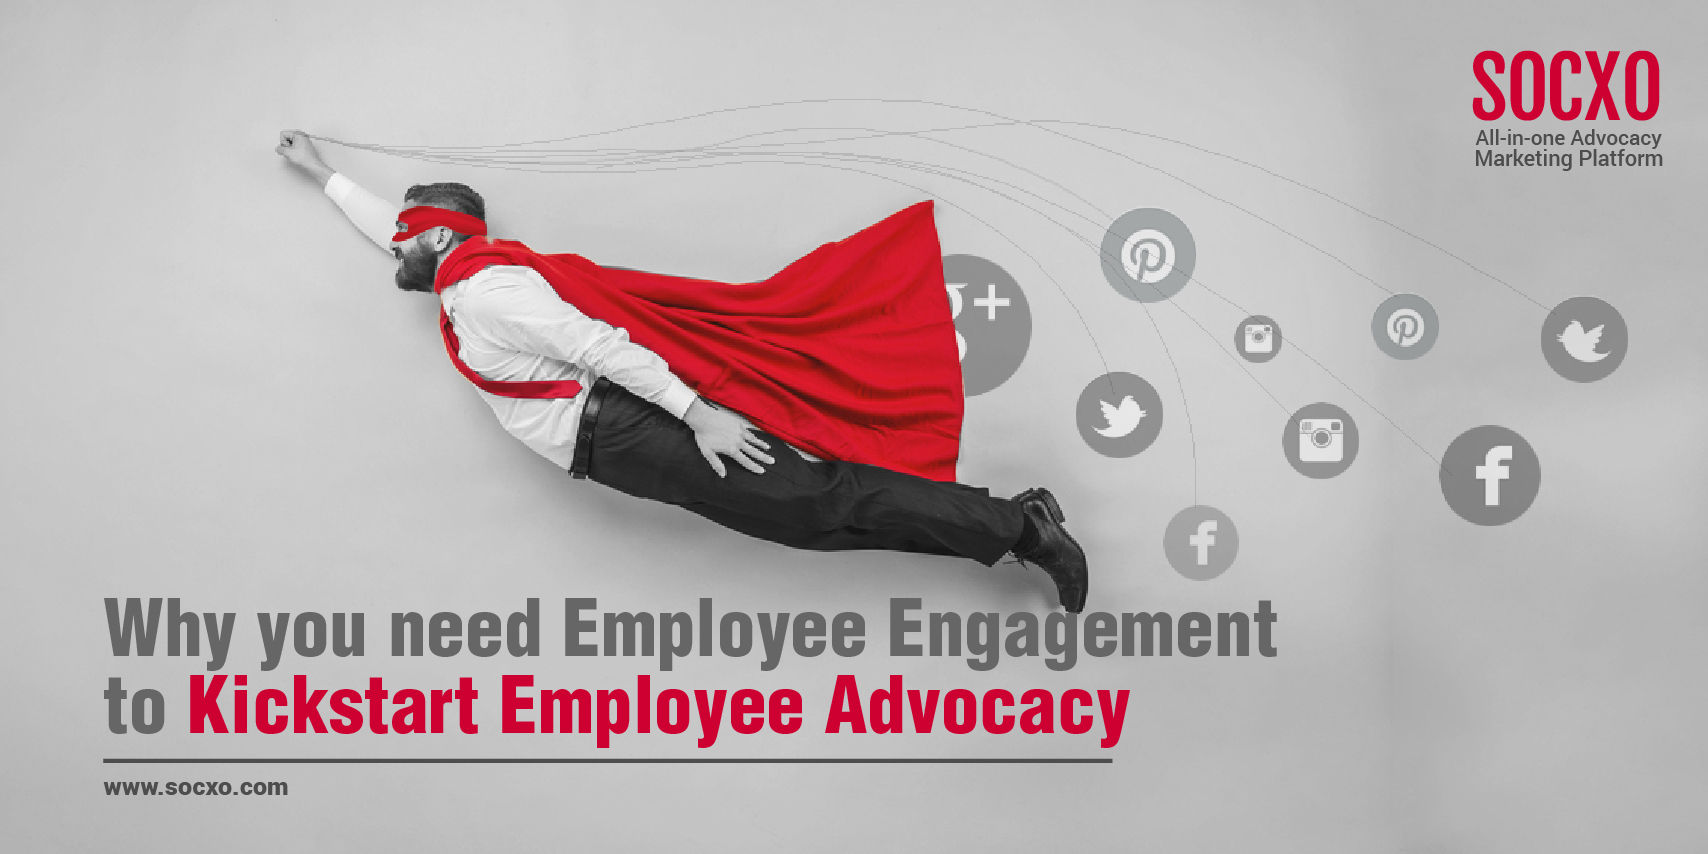 Why you need Employee Engagement to Kickstart Employee Advocacy-02-02-02